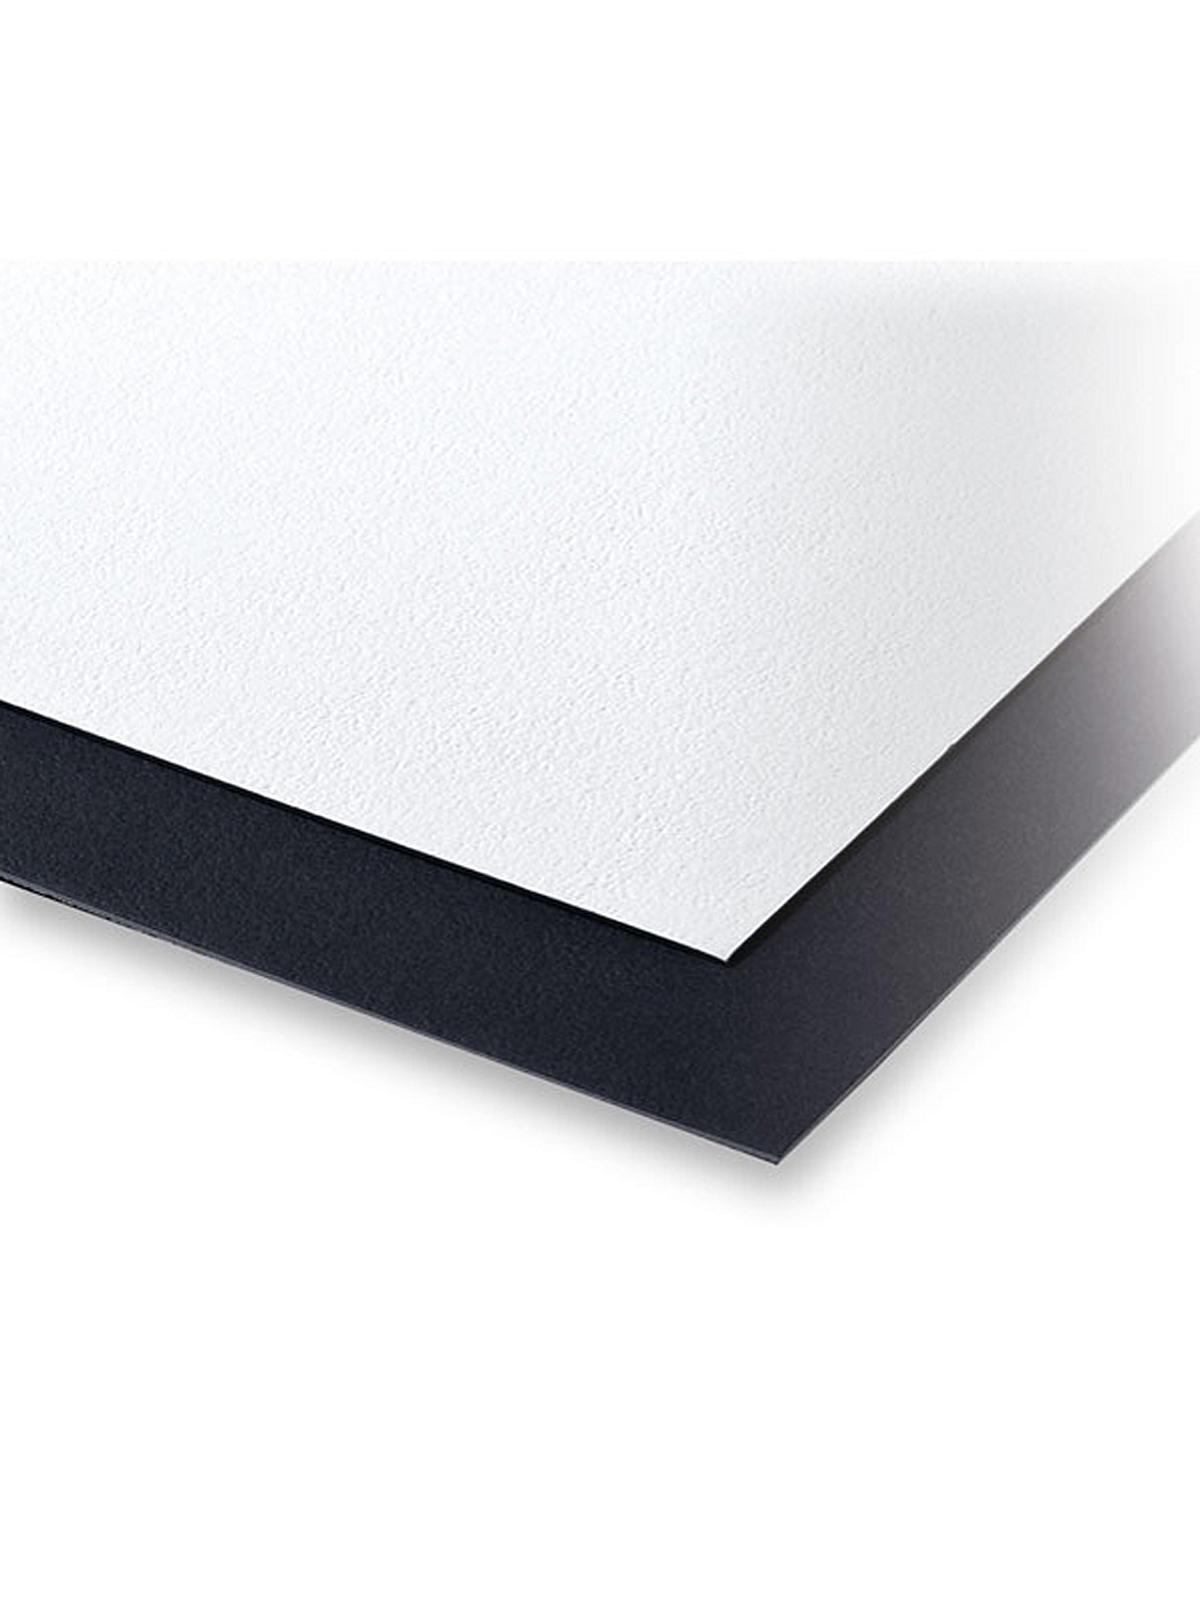 Pebble Board Black White